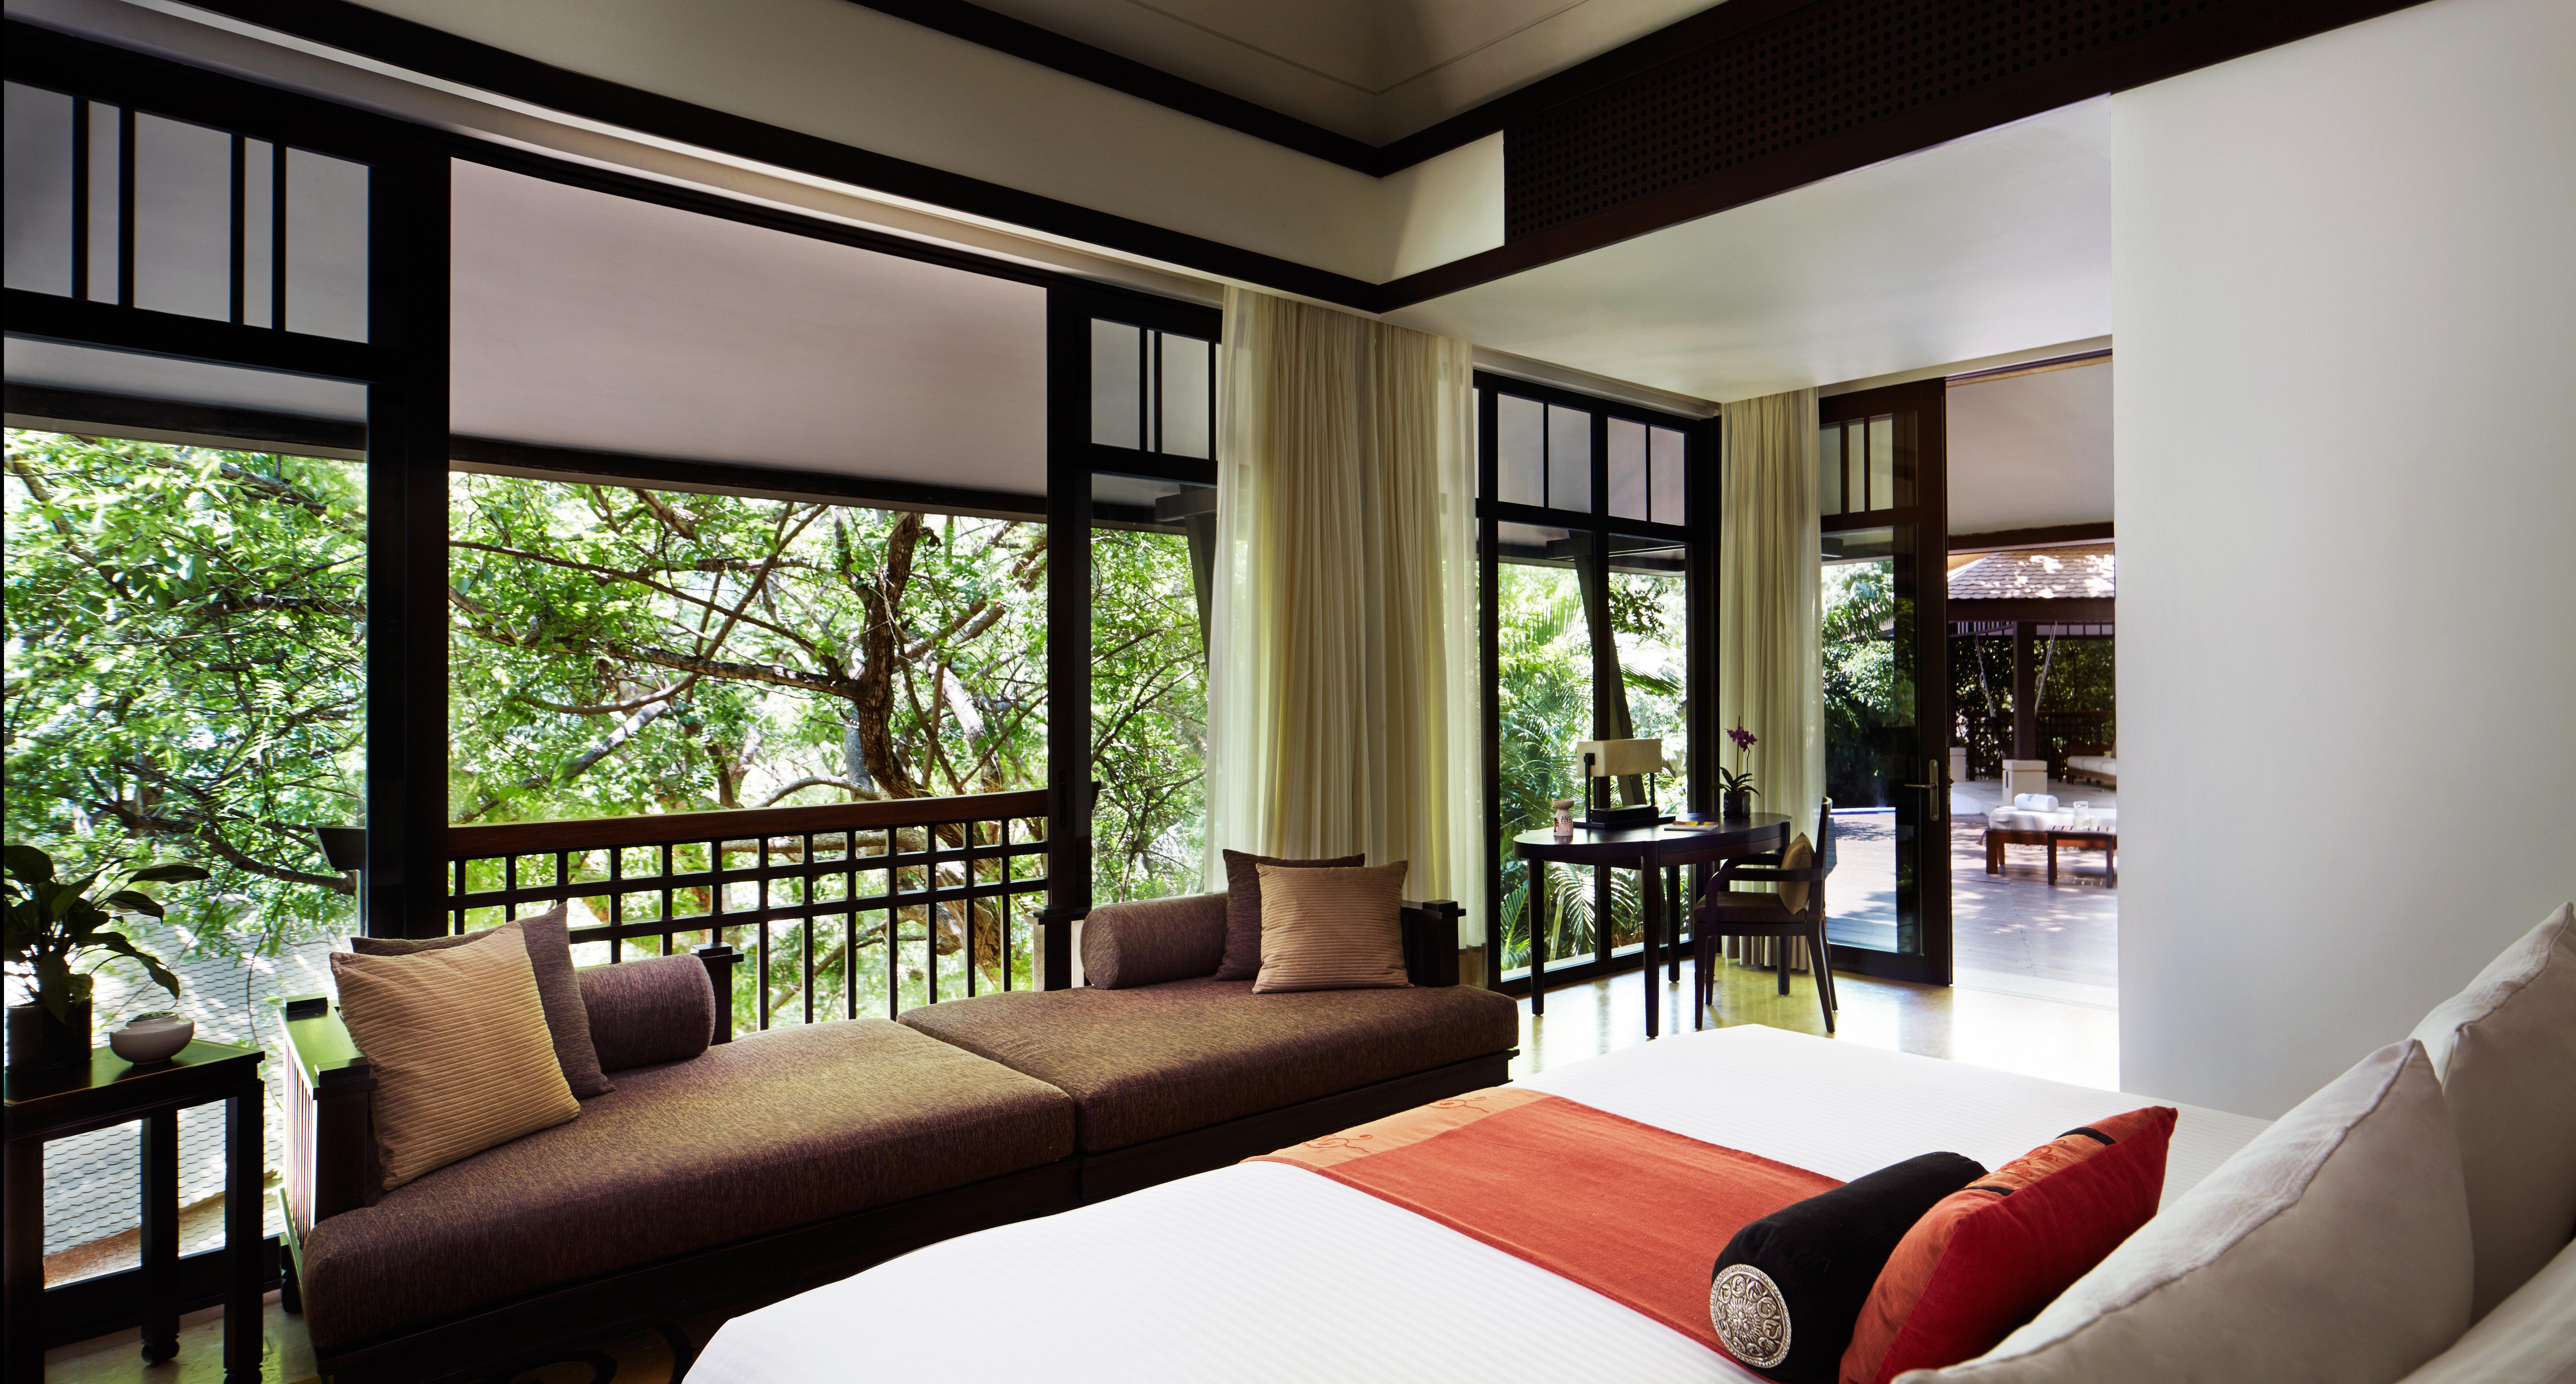 Bedroom Luxury Modern Romantic Scenic views Suite sofa property living room condominium home house Resort Villa mansion flat